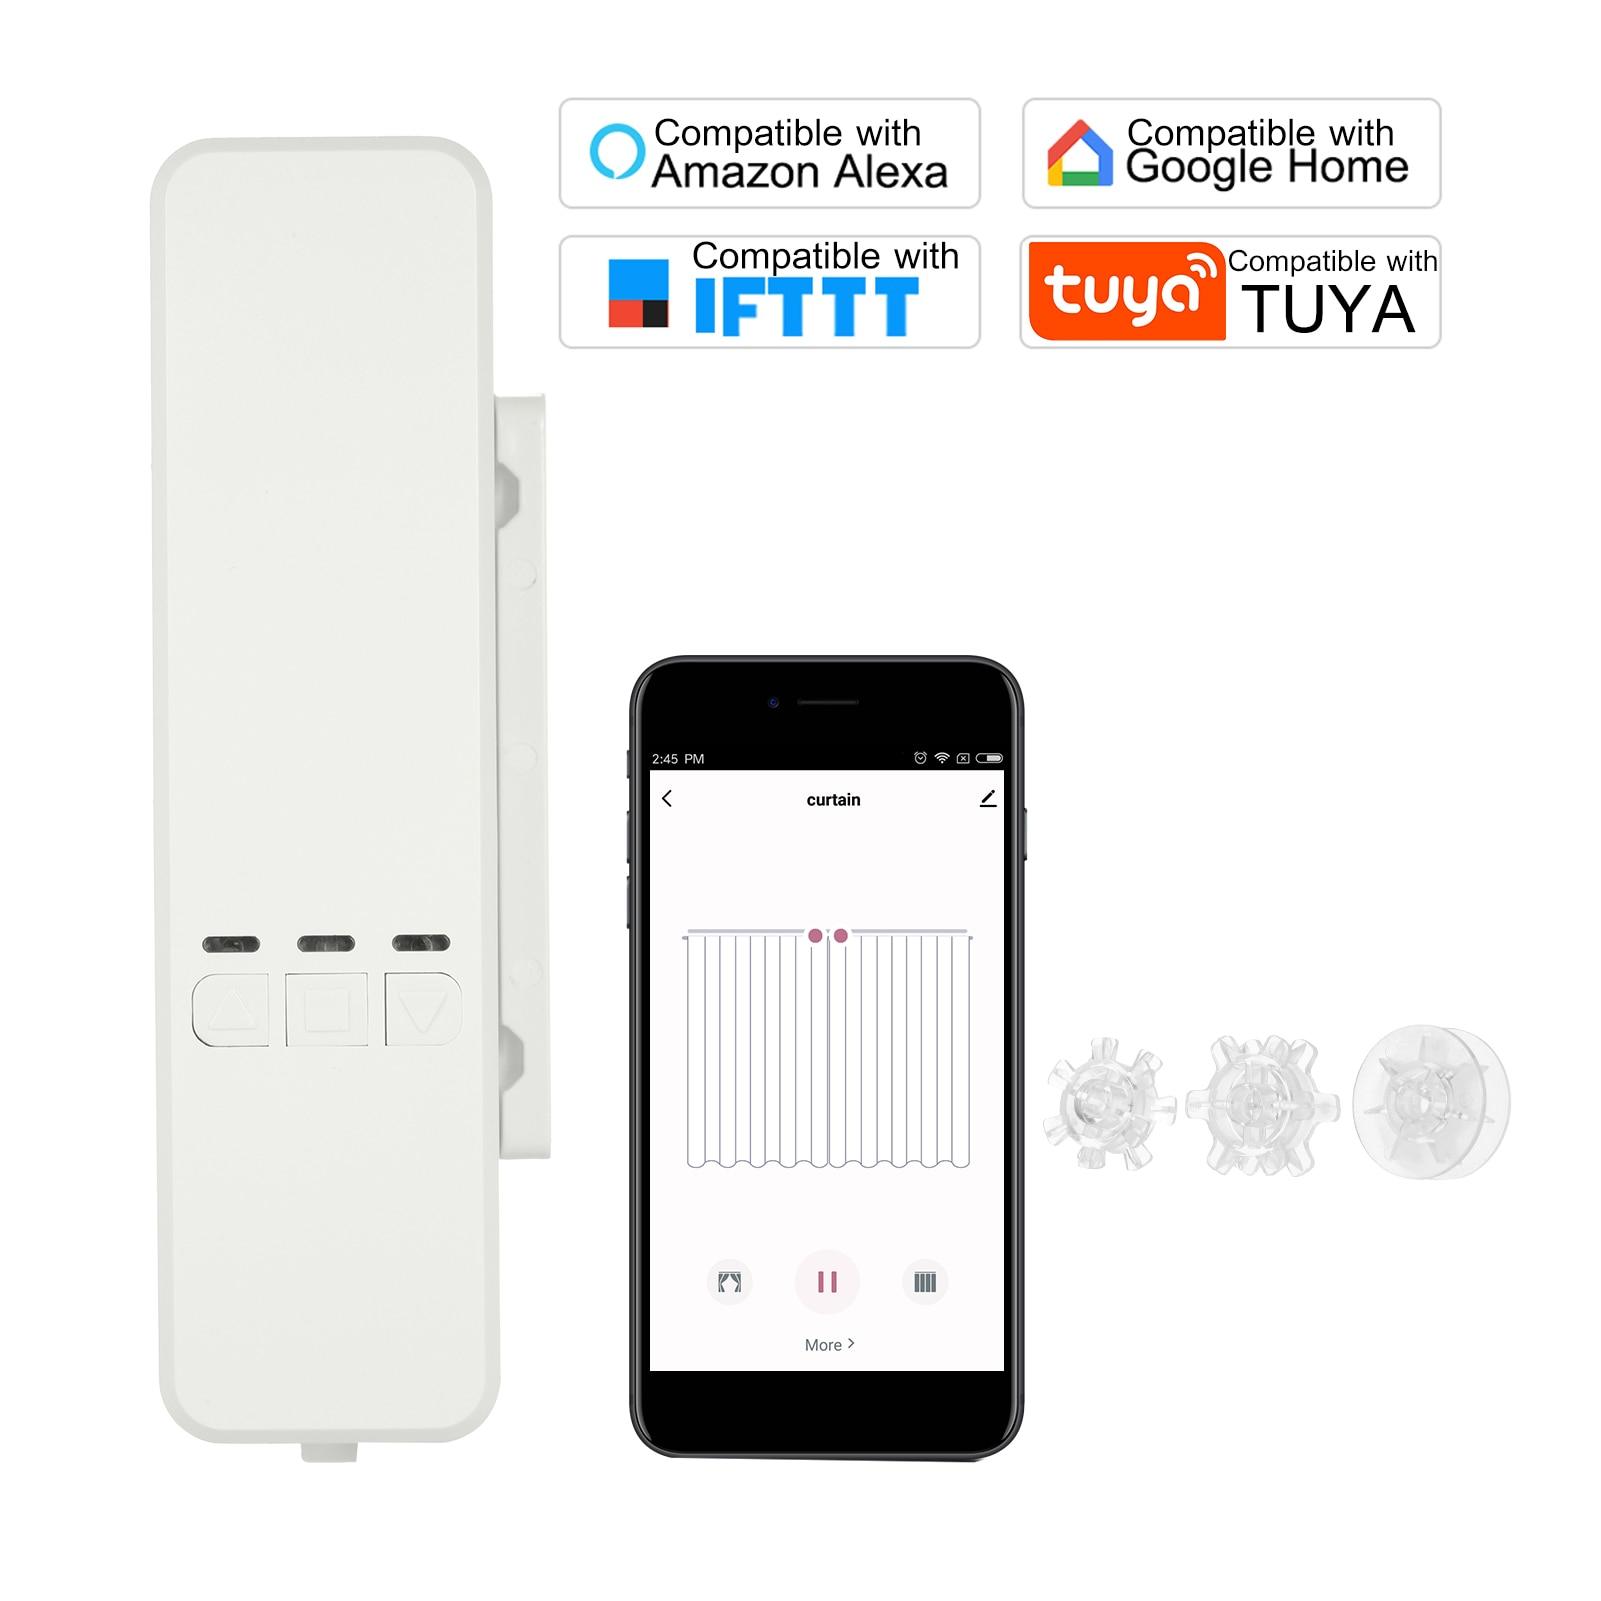 WiFi Tuya الذكية لتقوم بها بنفسك بمحركات سلسلة الستائر الدوارة الظل مصراع محرك المحرك ل أليكسا جوجل App التحكم الصوتي الستار المحرك